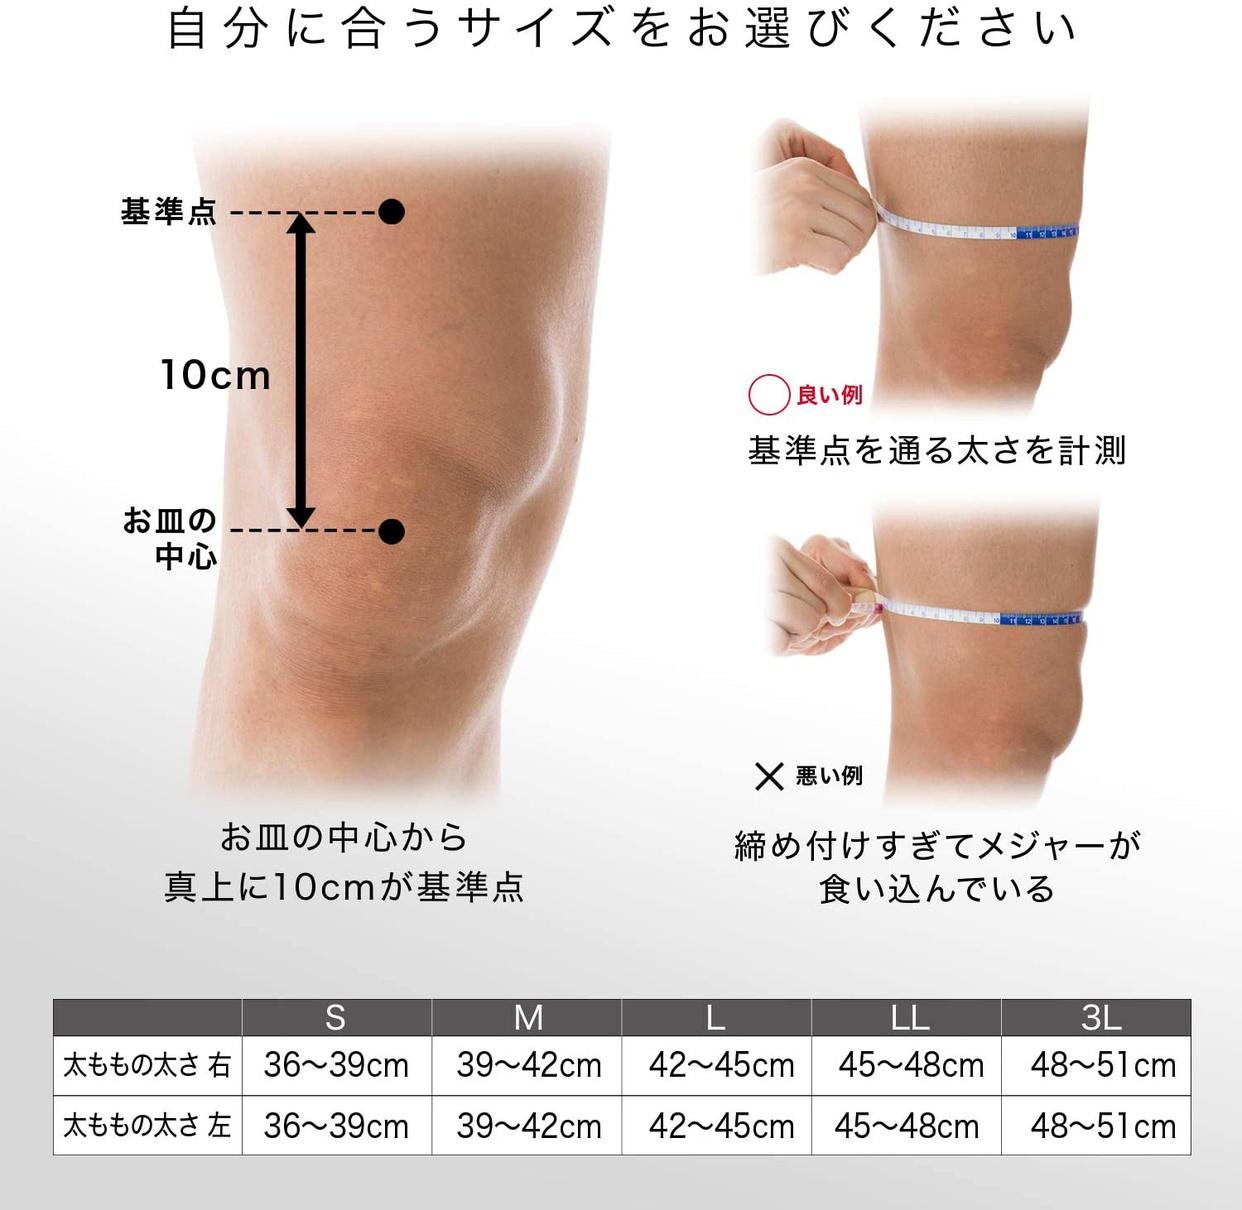 ZAMST(ザムスト) 膝用サポーター RK-1Plusの商品画像6